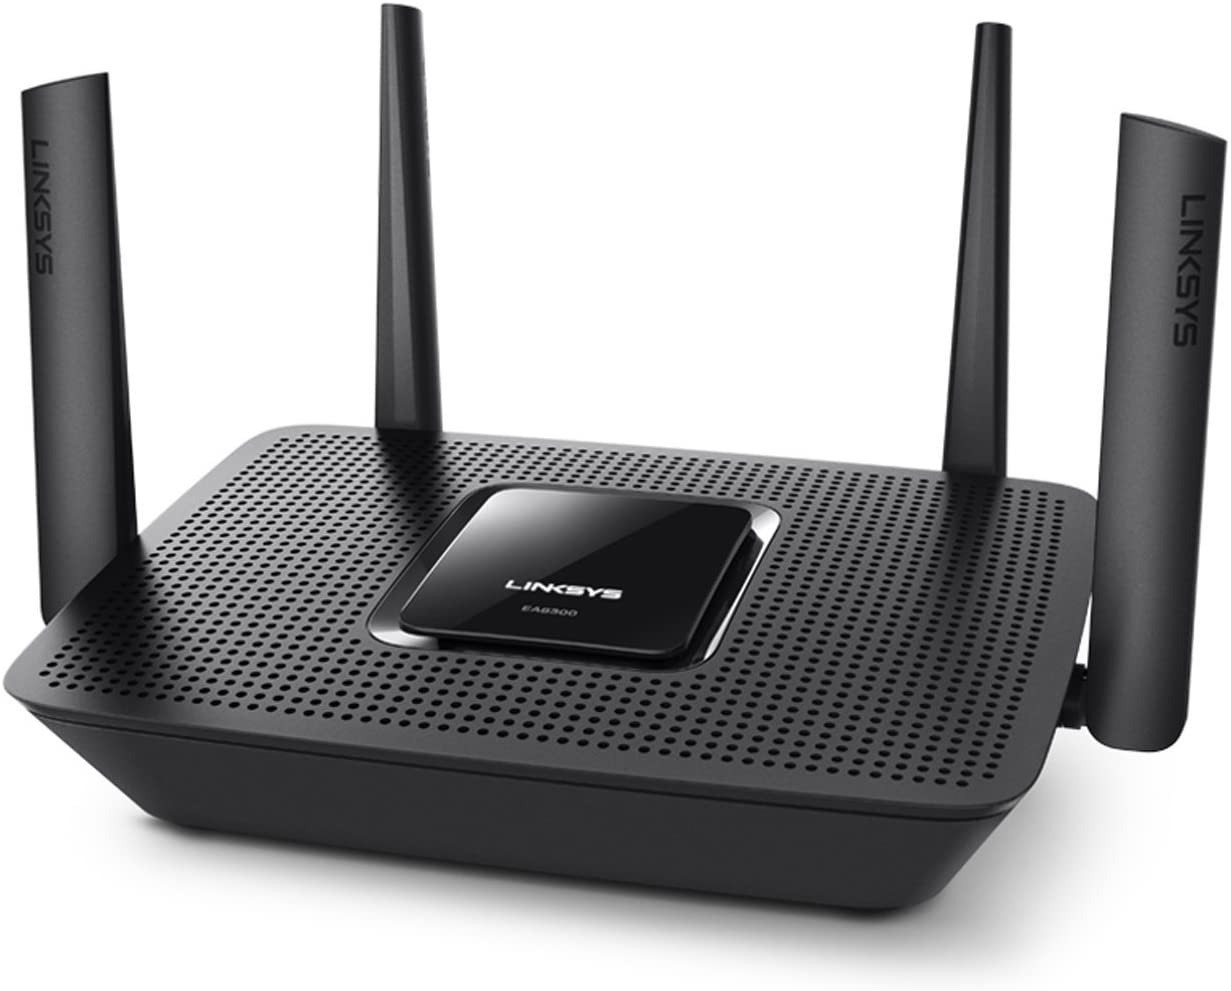 Linksys EA8300 - Router Wi-Fi AC2200 Tri-Banda MAX-Stream (MU-MIMO, 4 Antenas, Beamforming, 4 x Gigabit Ethernet, 1 x USB 3.0) Color Negro